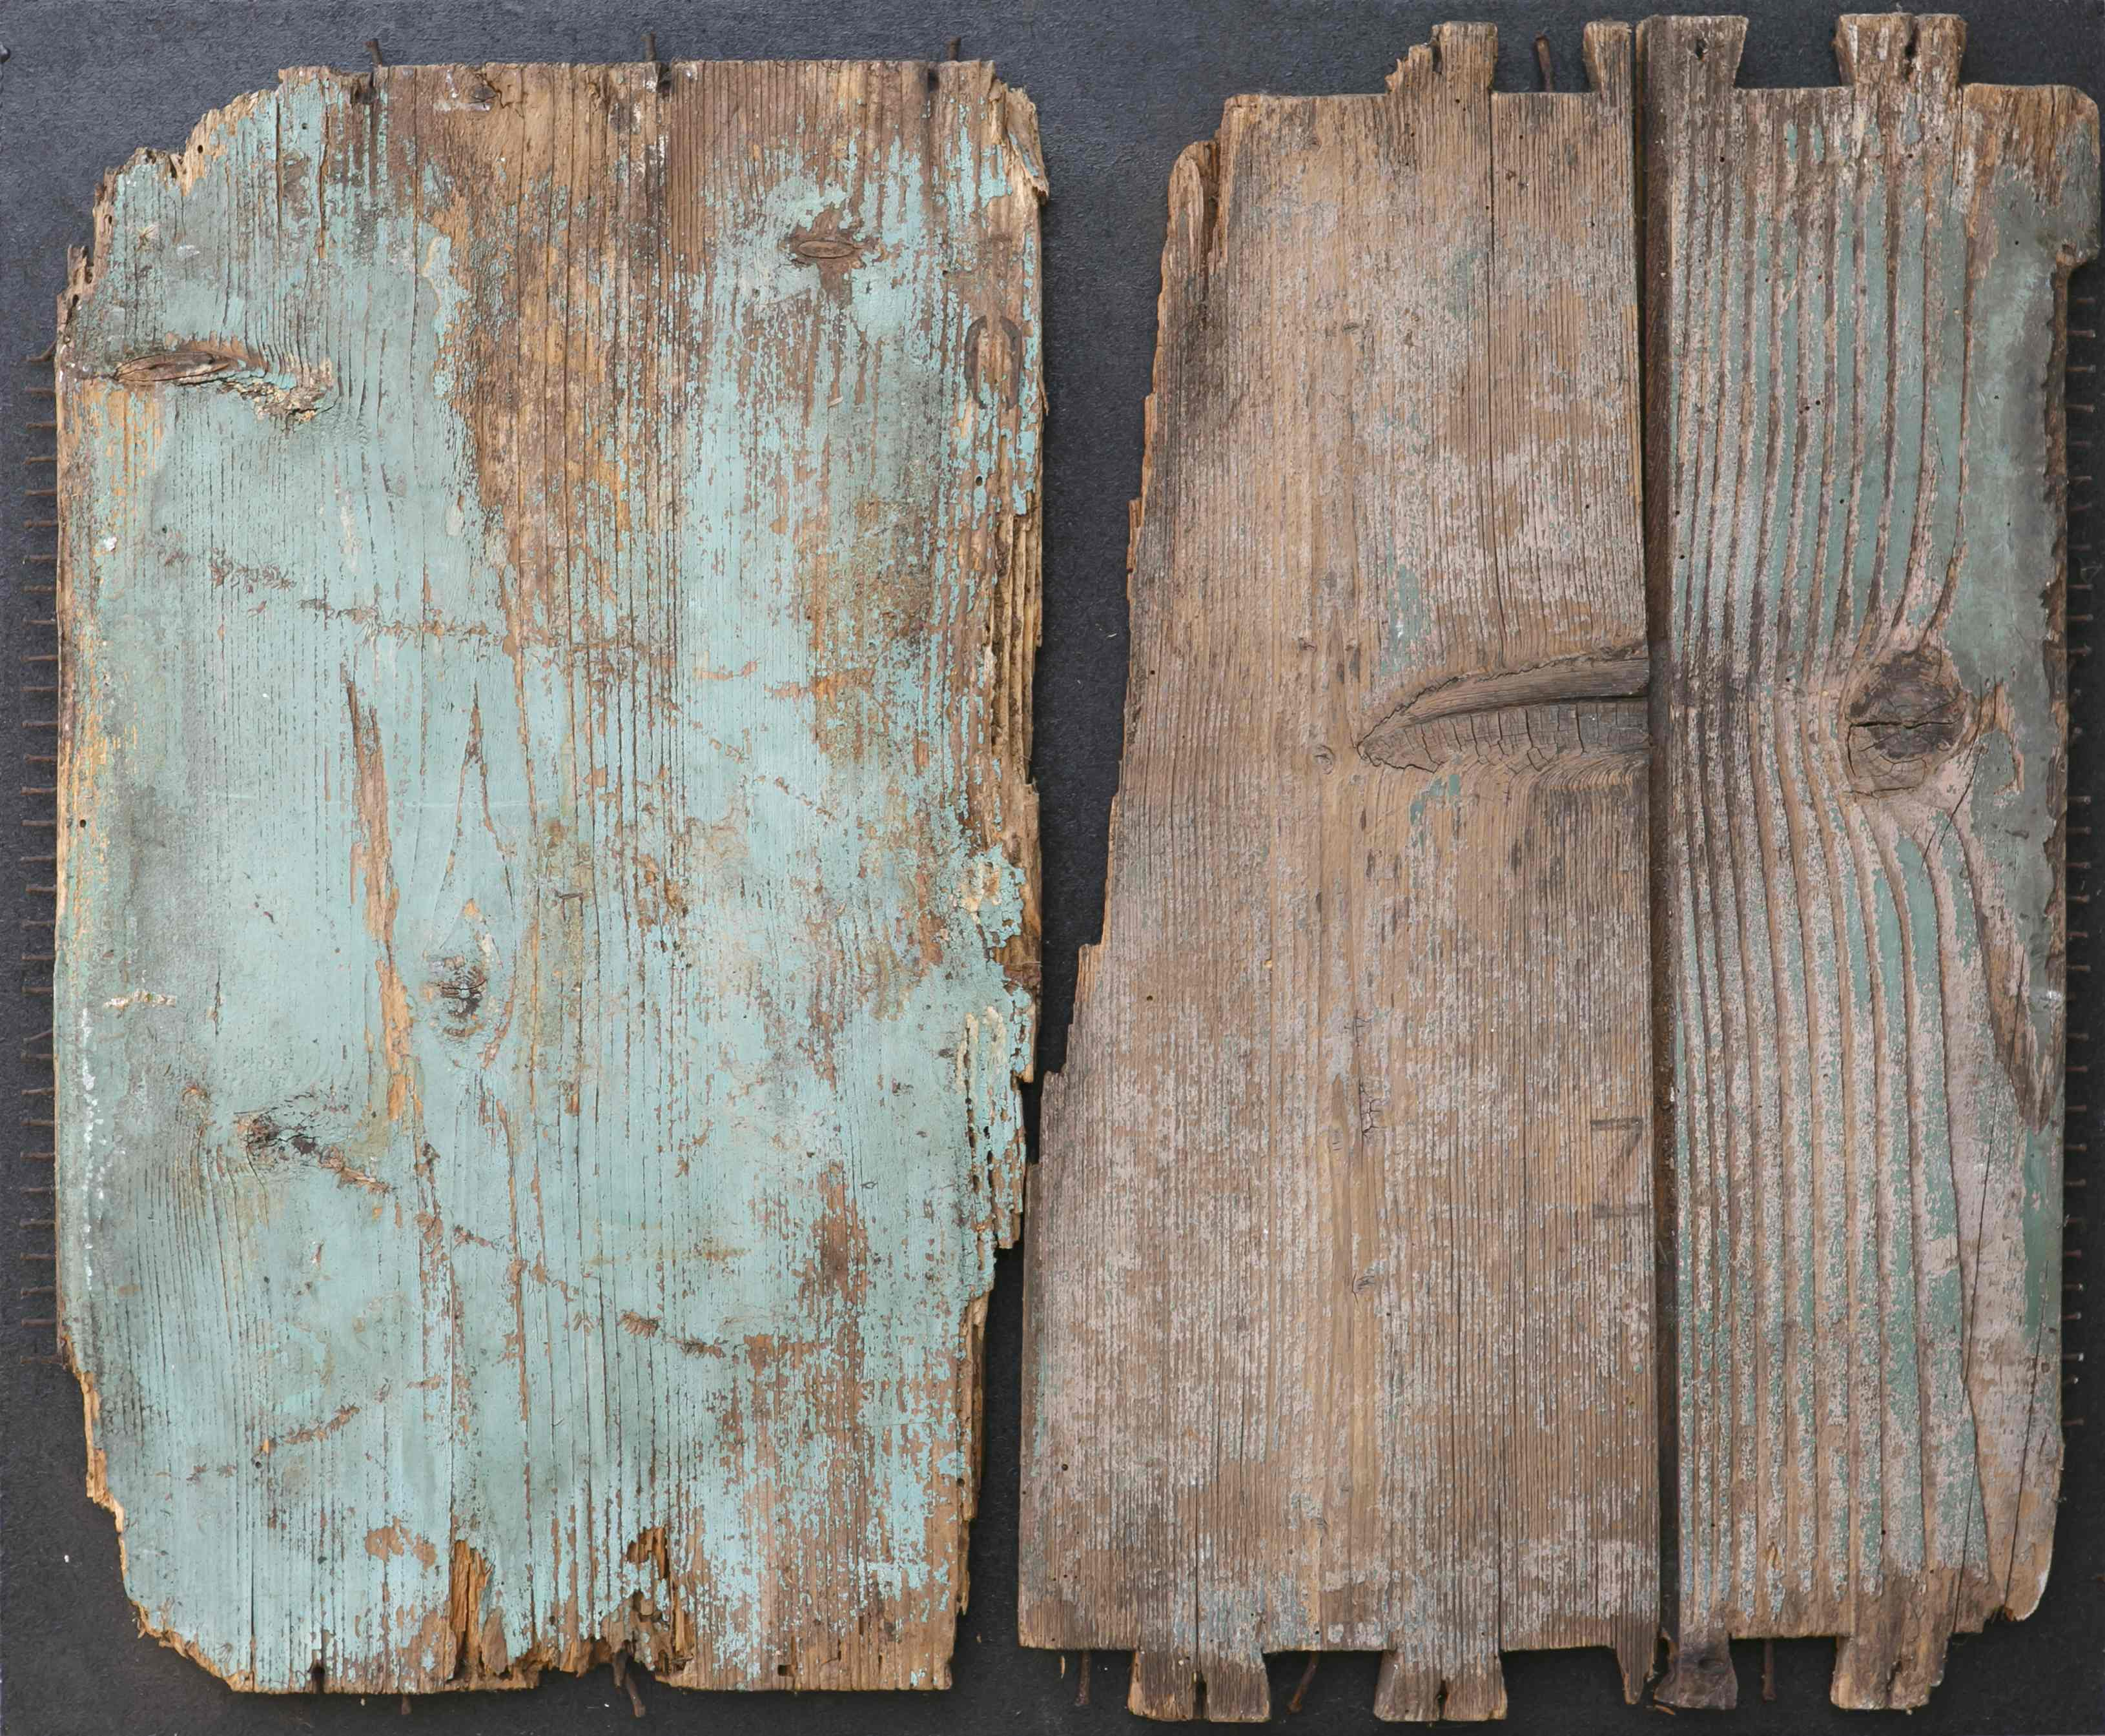 Frammenti di strutture, legno su tavola, 63x53, 2003